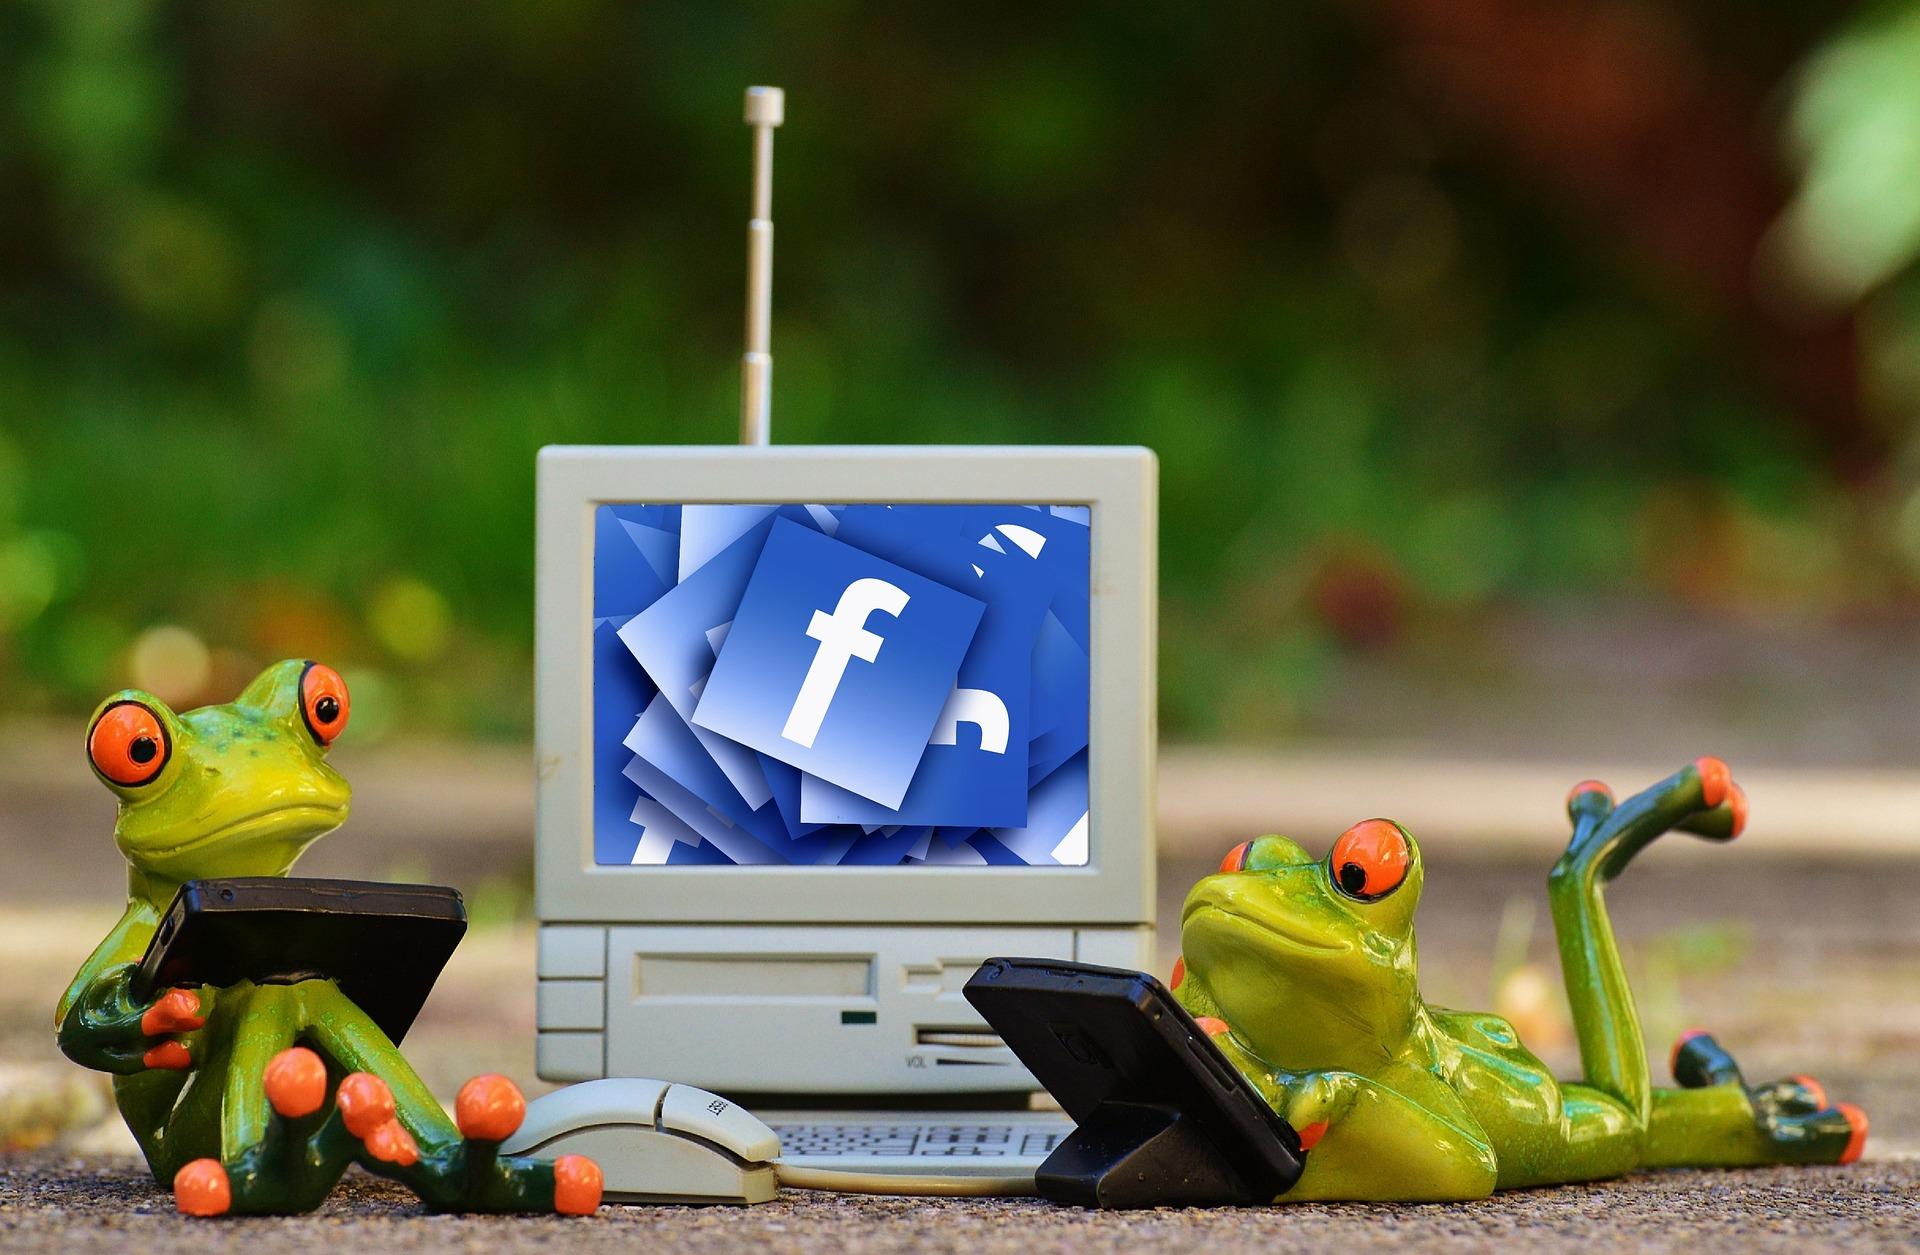 10 Things Realtors Should Be Doing on Social Media